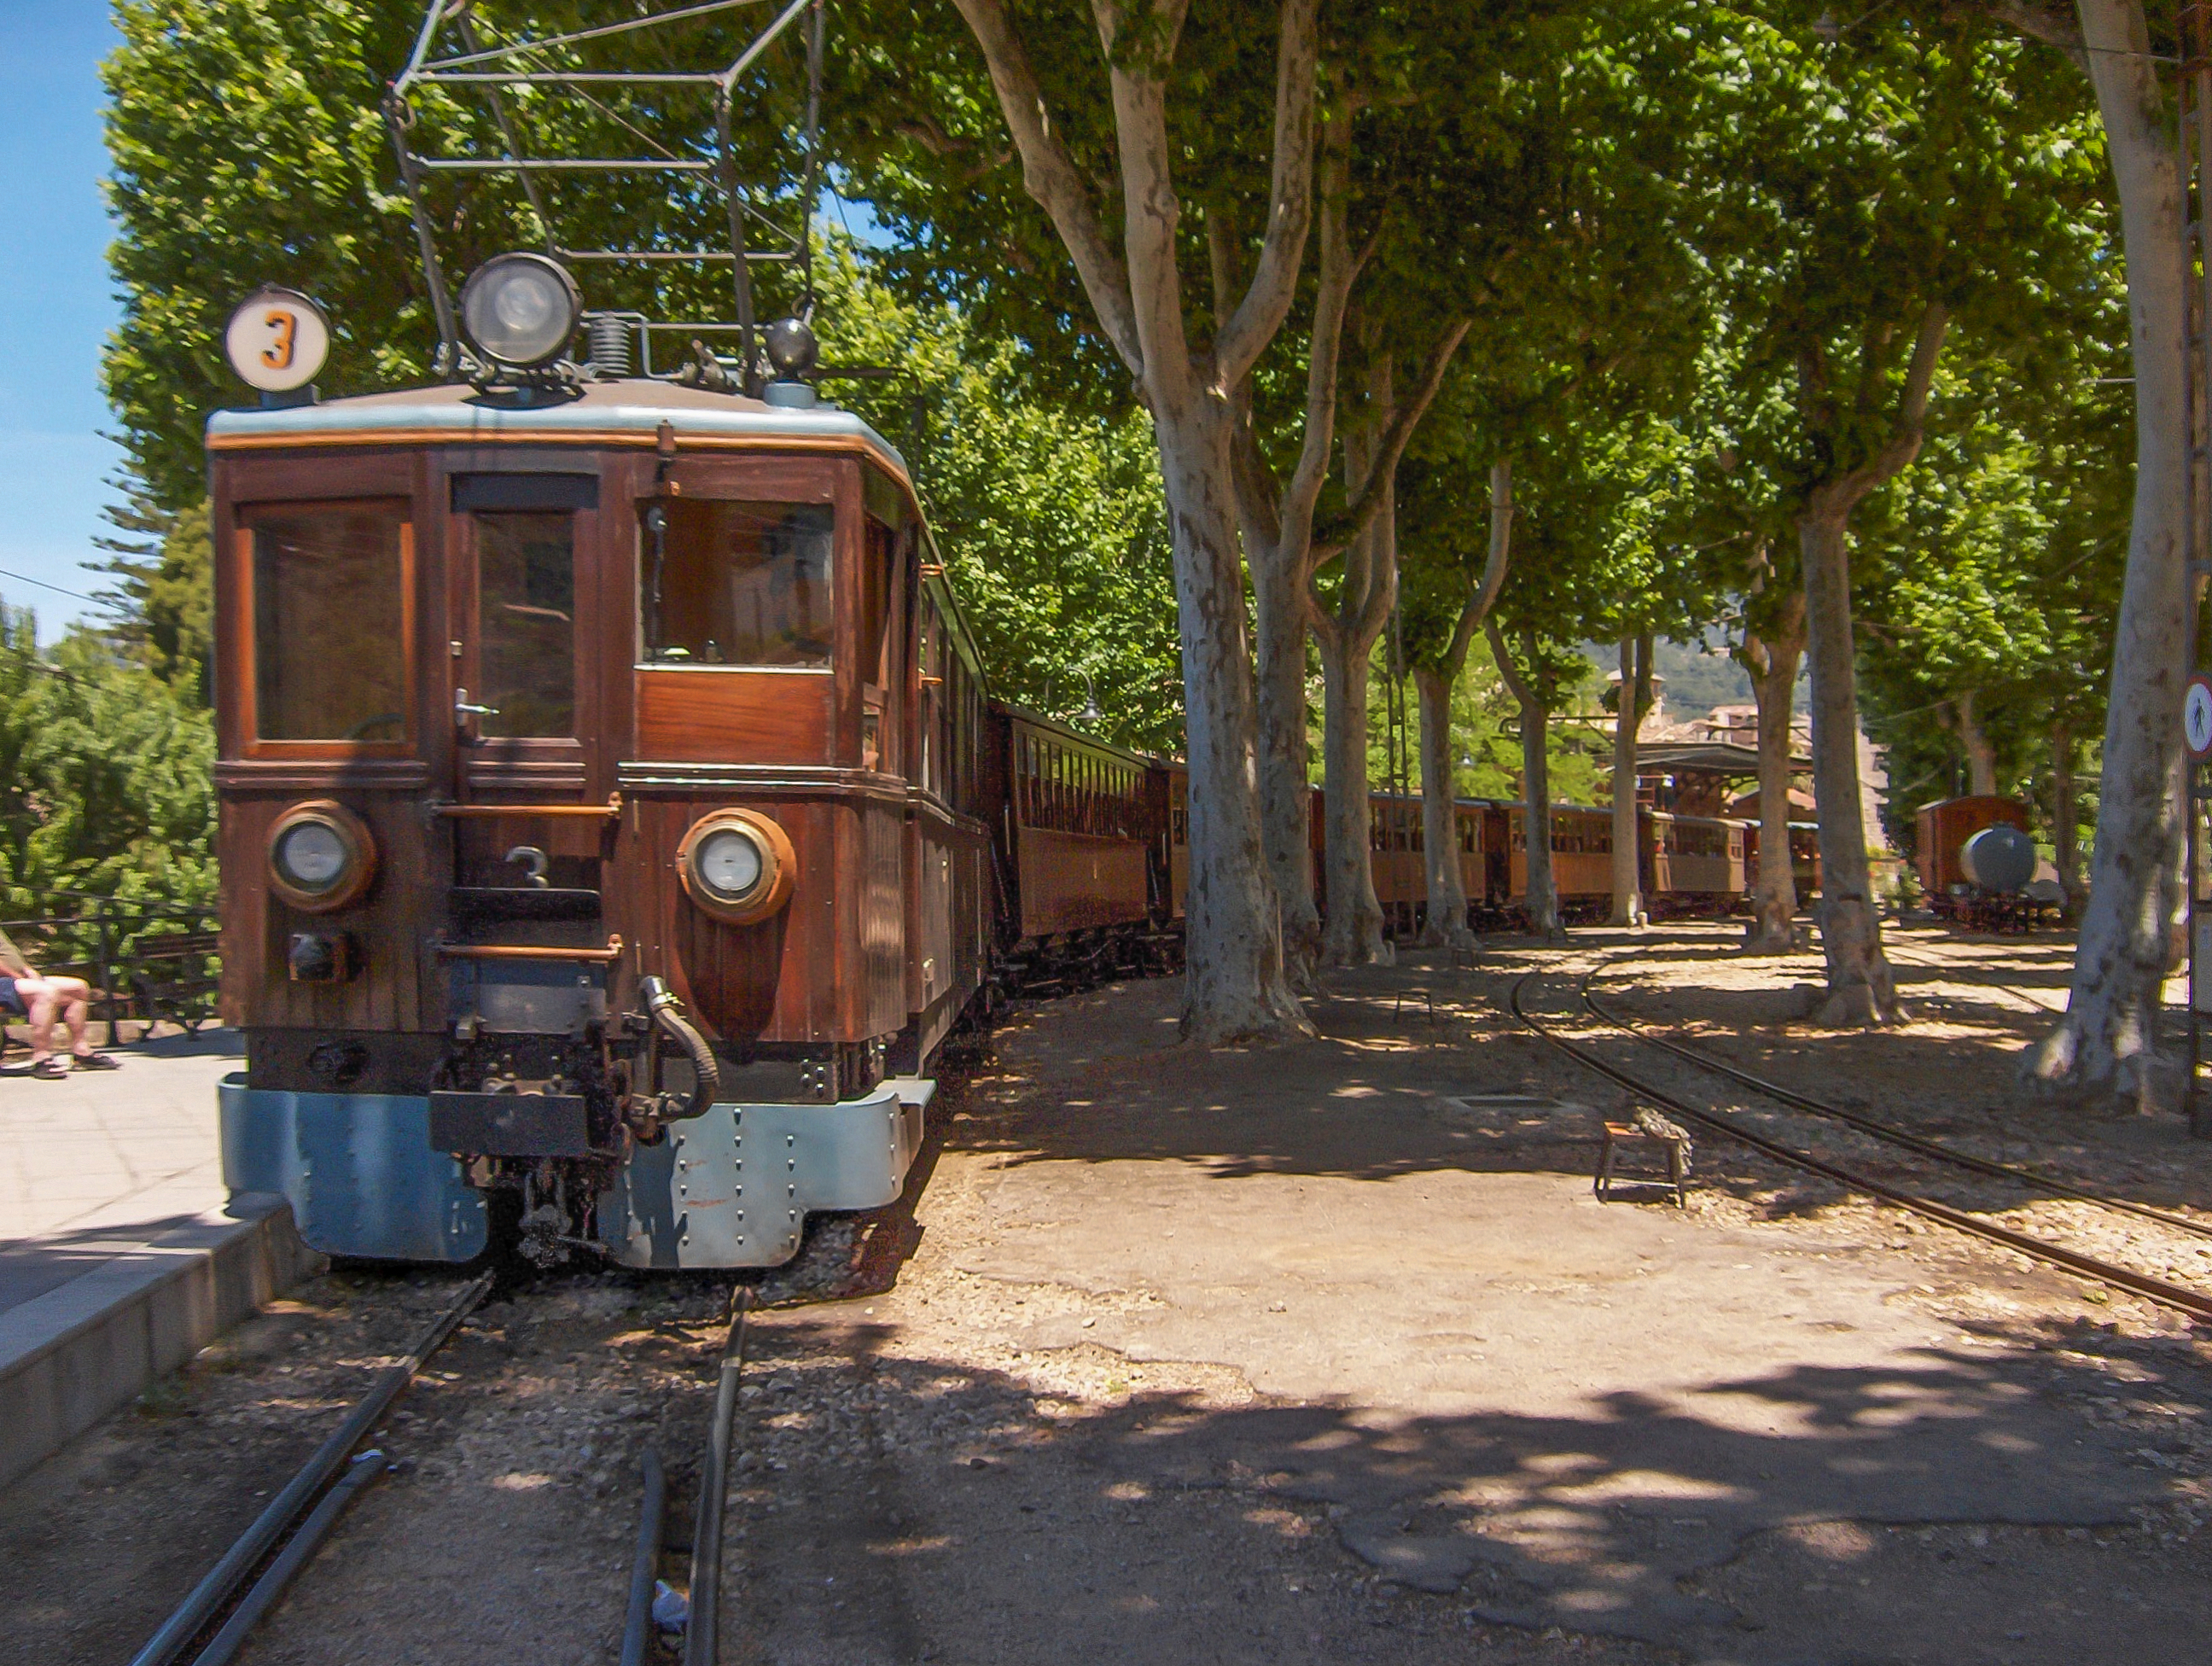 Ferrocarril de Sóller in Sóller